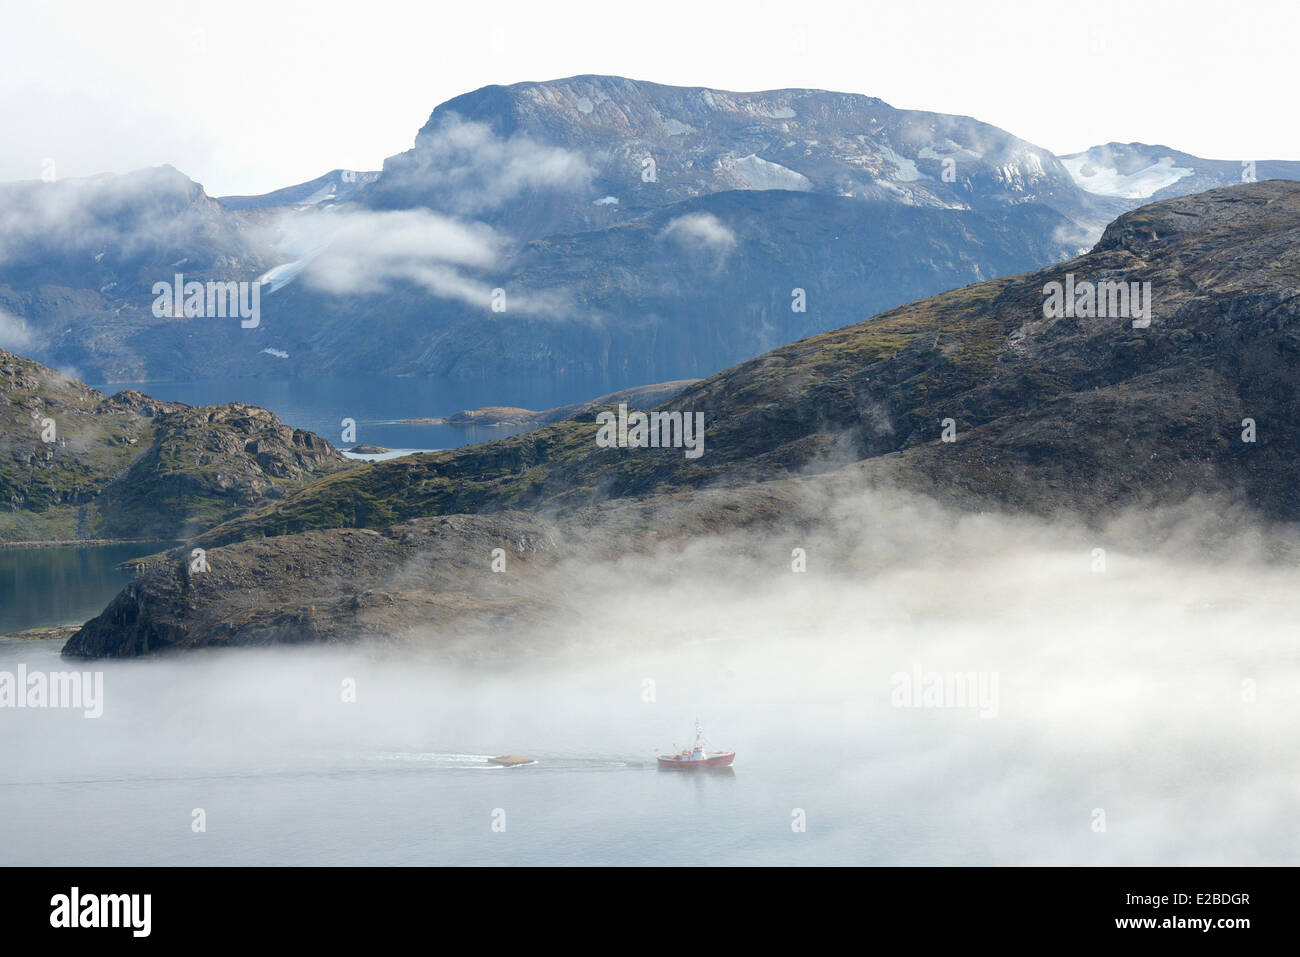 Le Groenland, fjord Upernavik, bateau de pêche Photo Stock